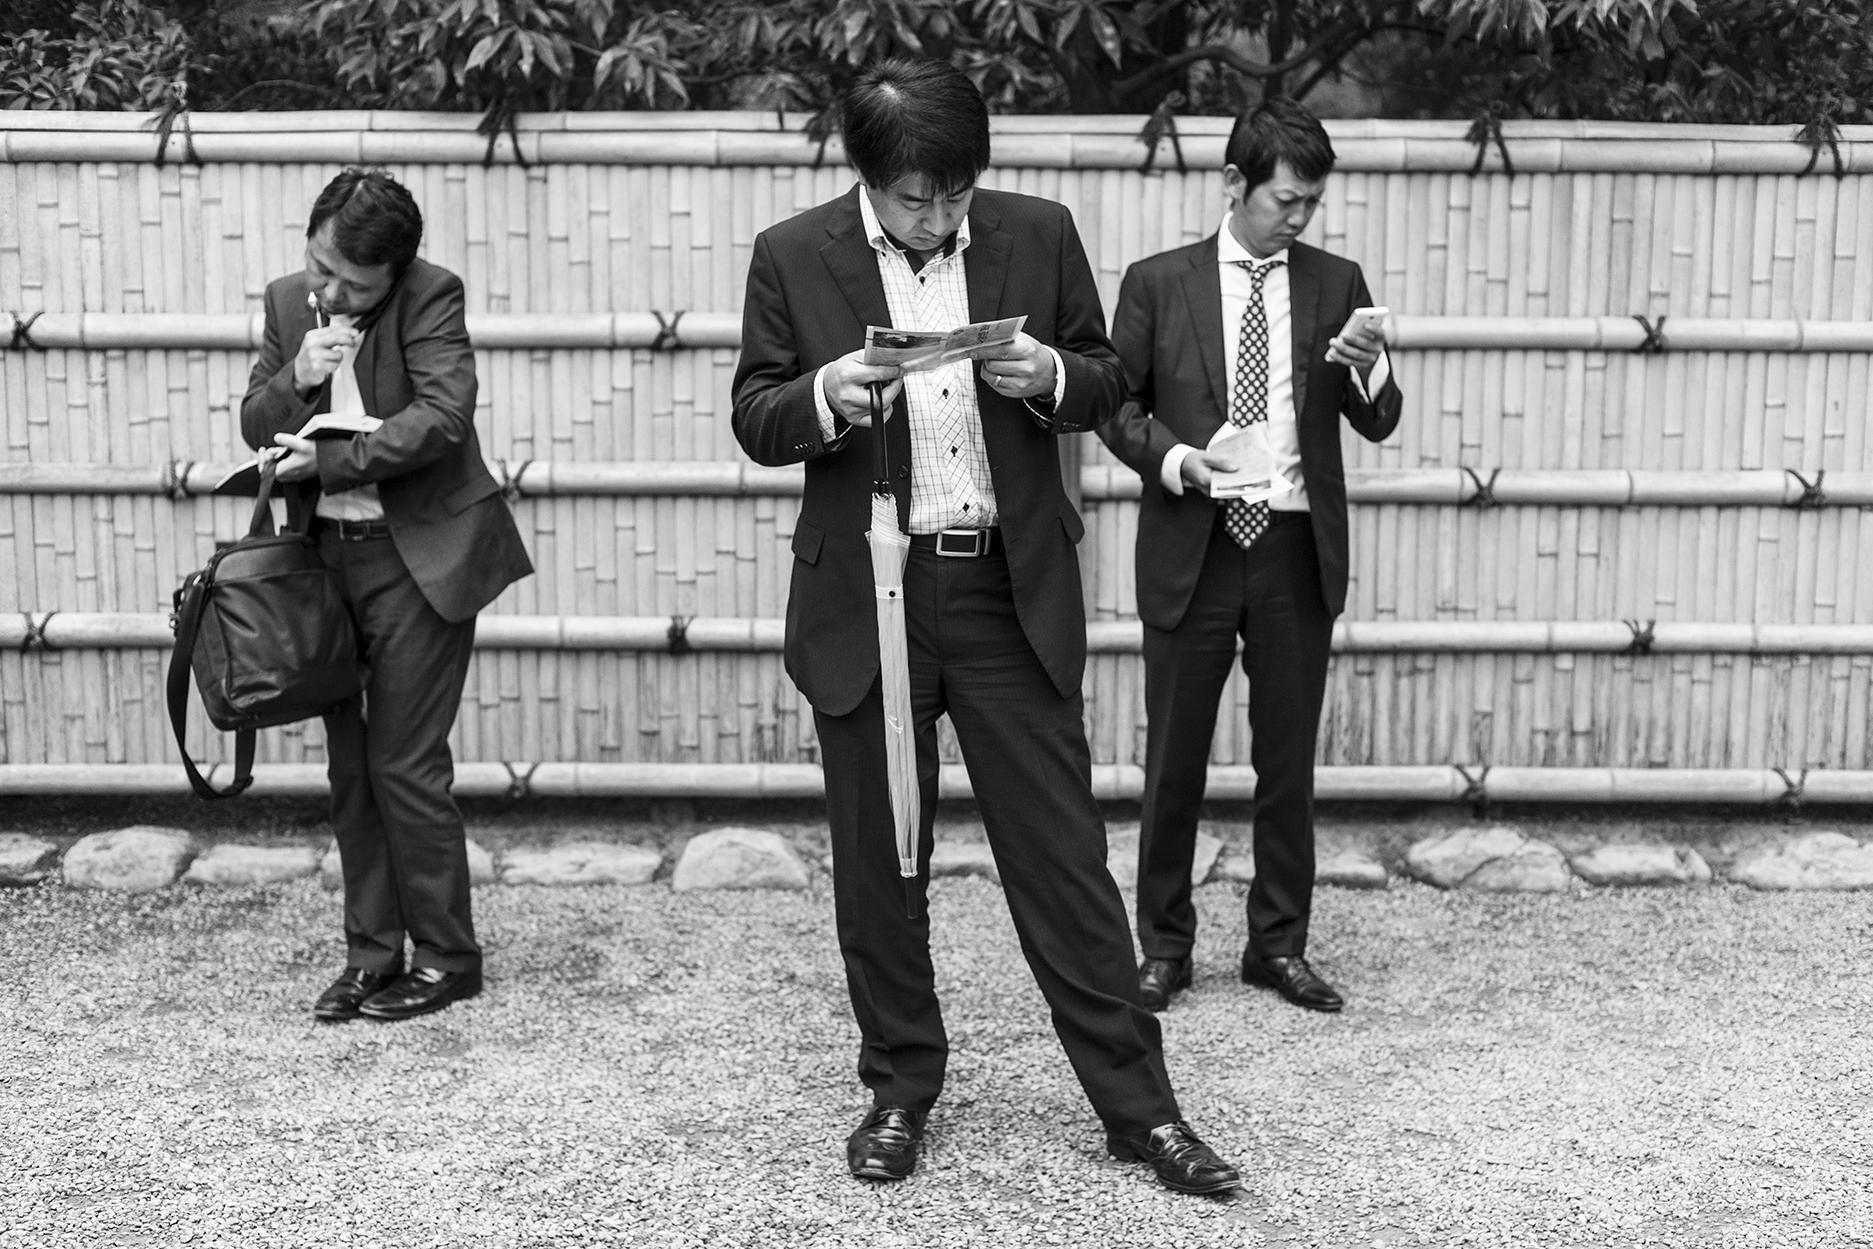 cravates-Kyoto-Japon-octobre-2016.jpg